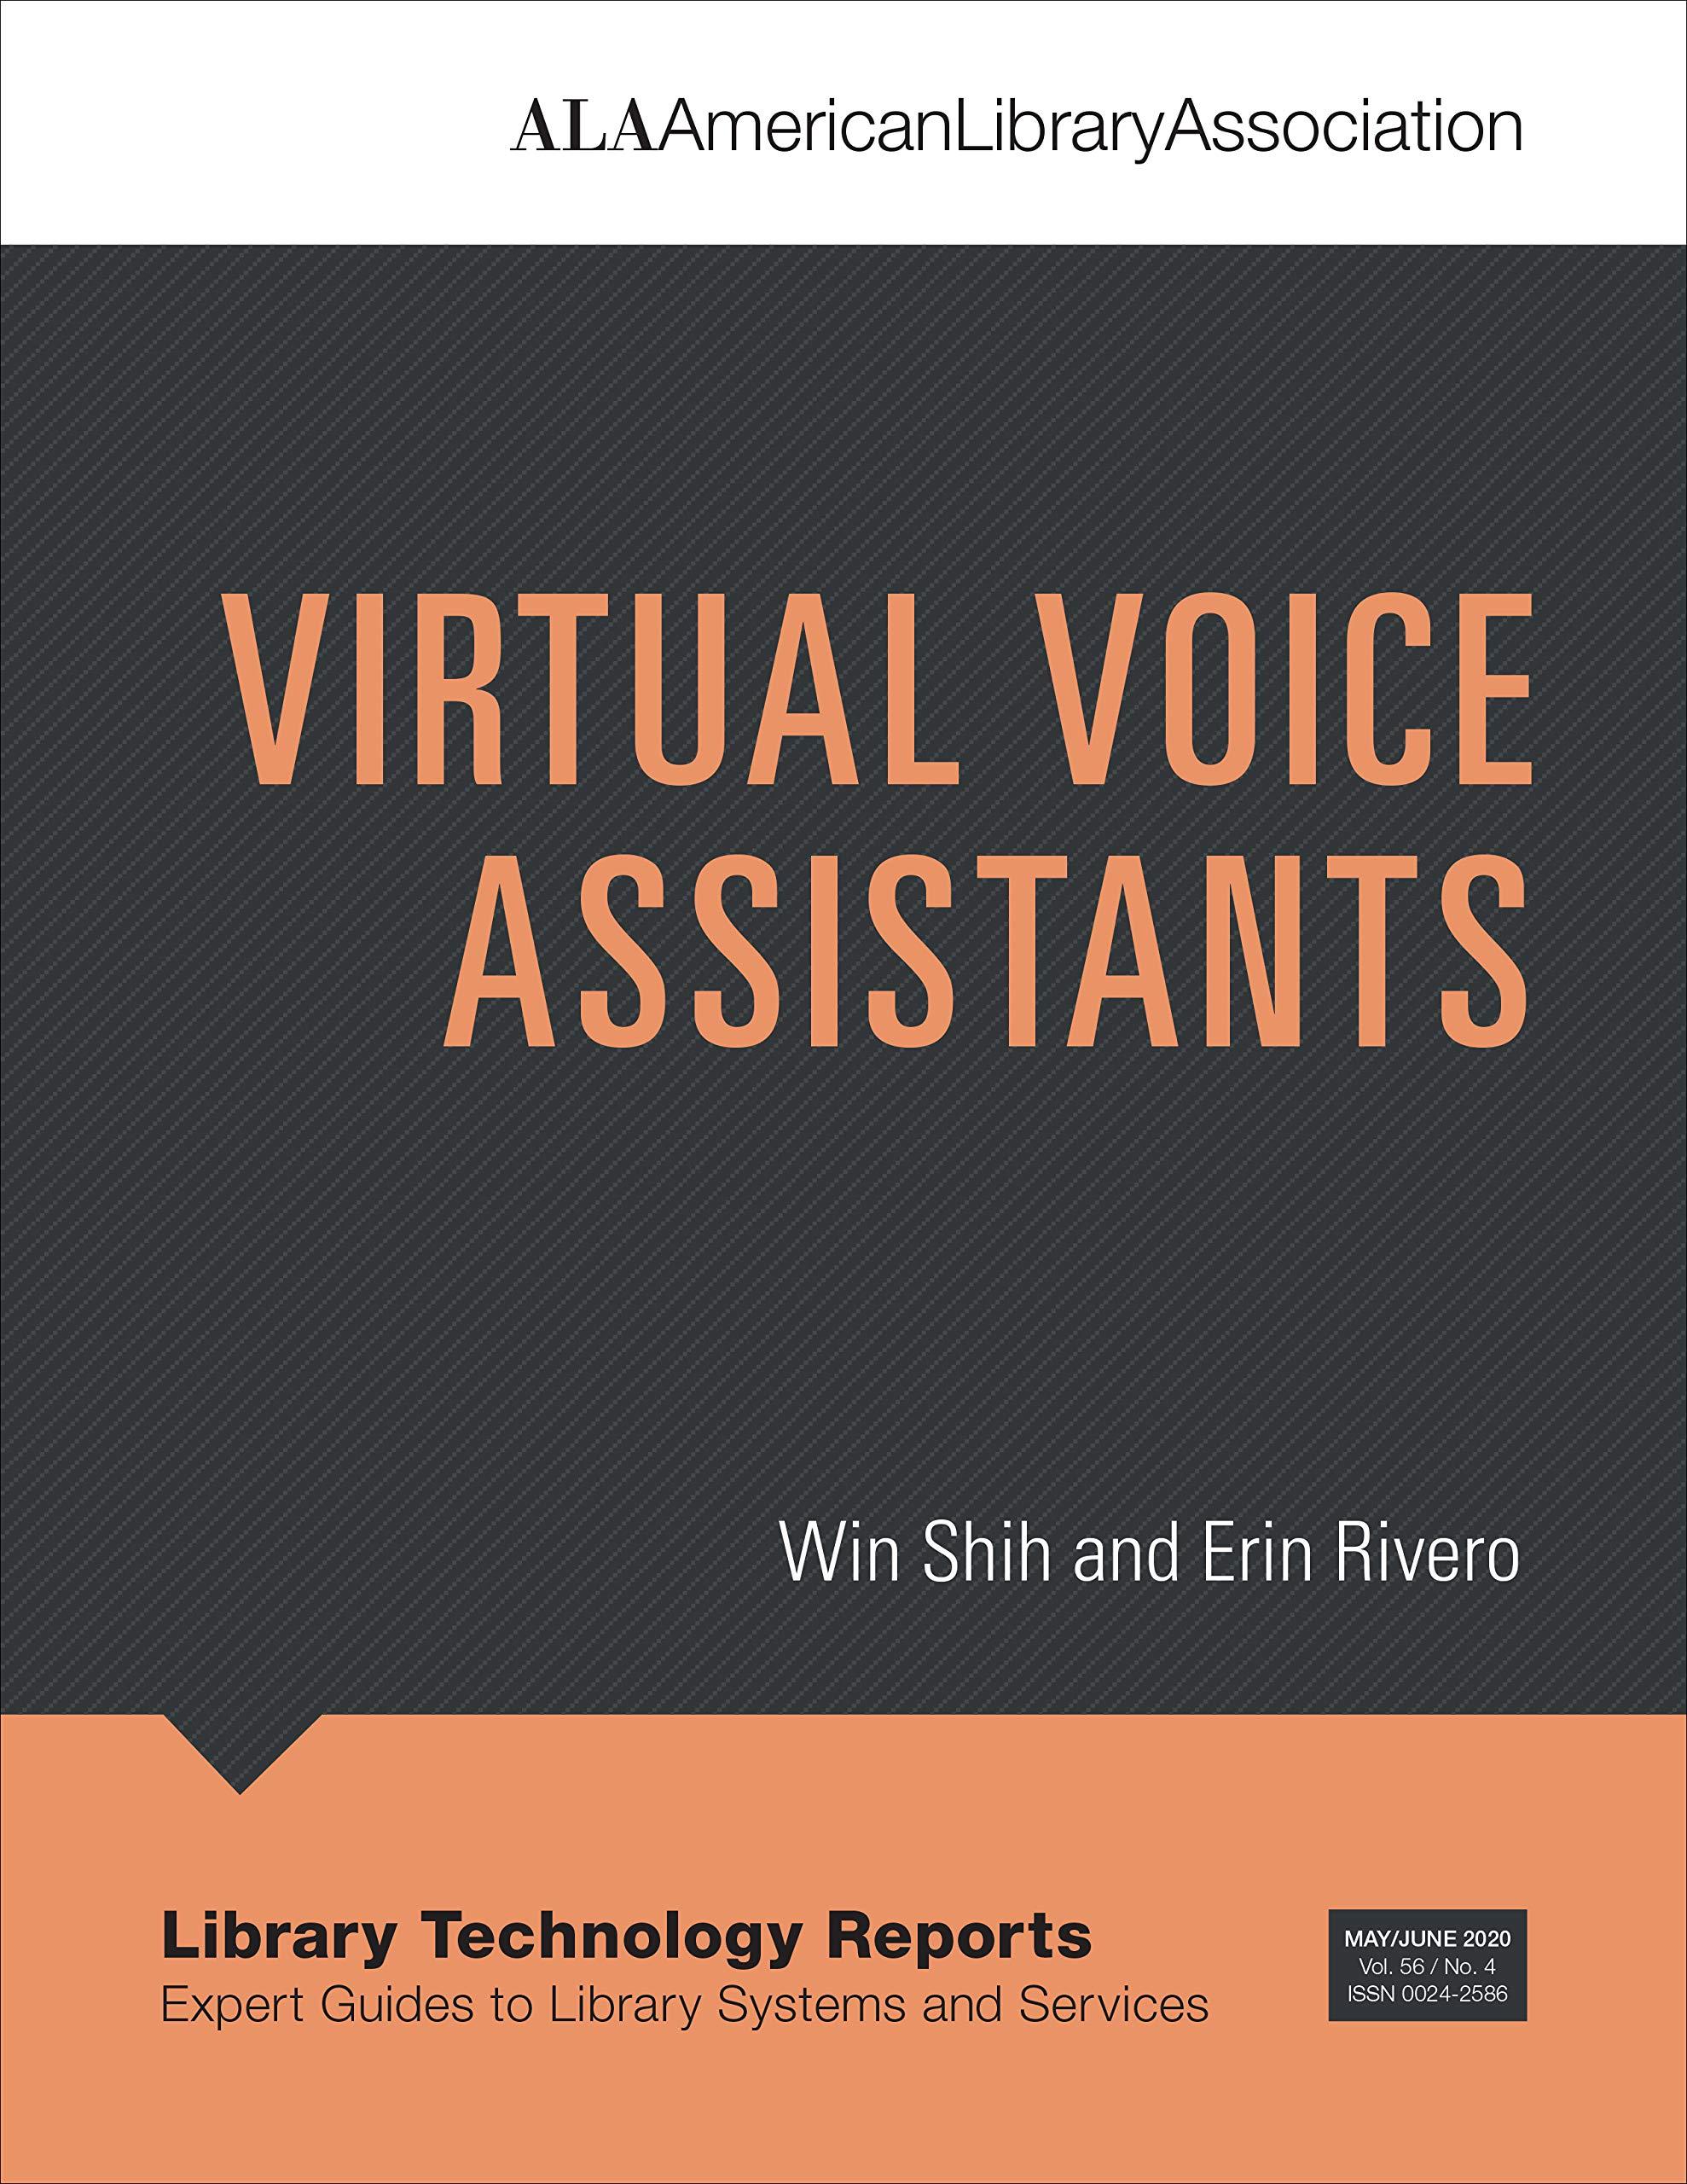 Virtual Voice Assistants (Library Technology Reports): Amazon.es: Rivero,  Erin, Shih, Win: Libros en idiomas extranjeros